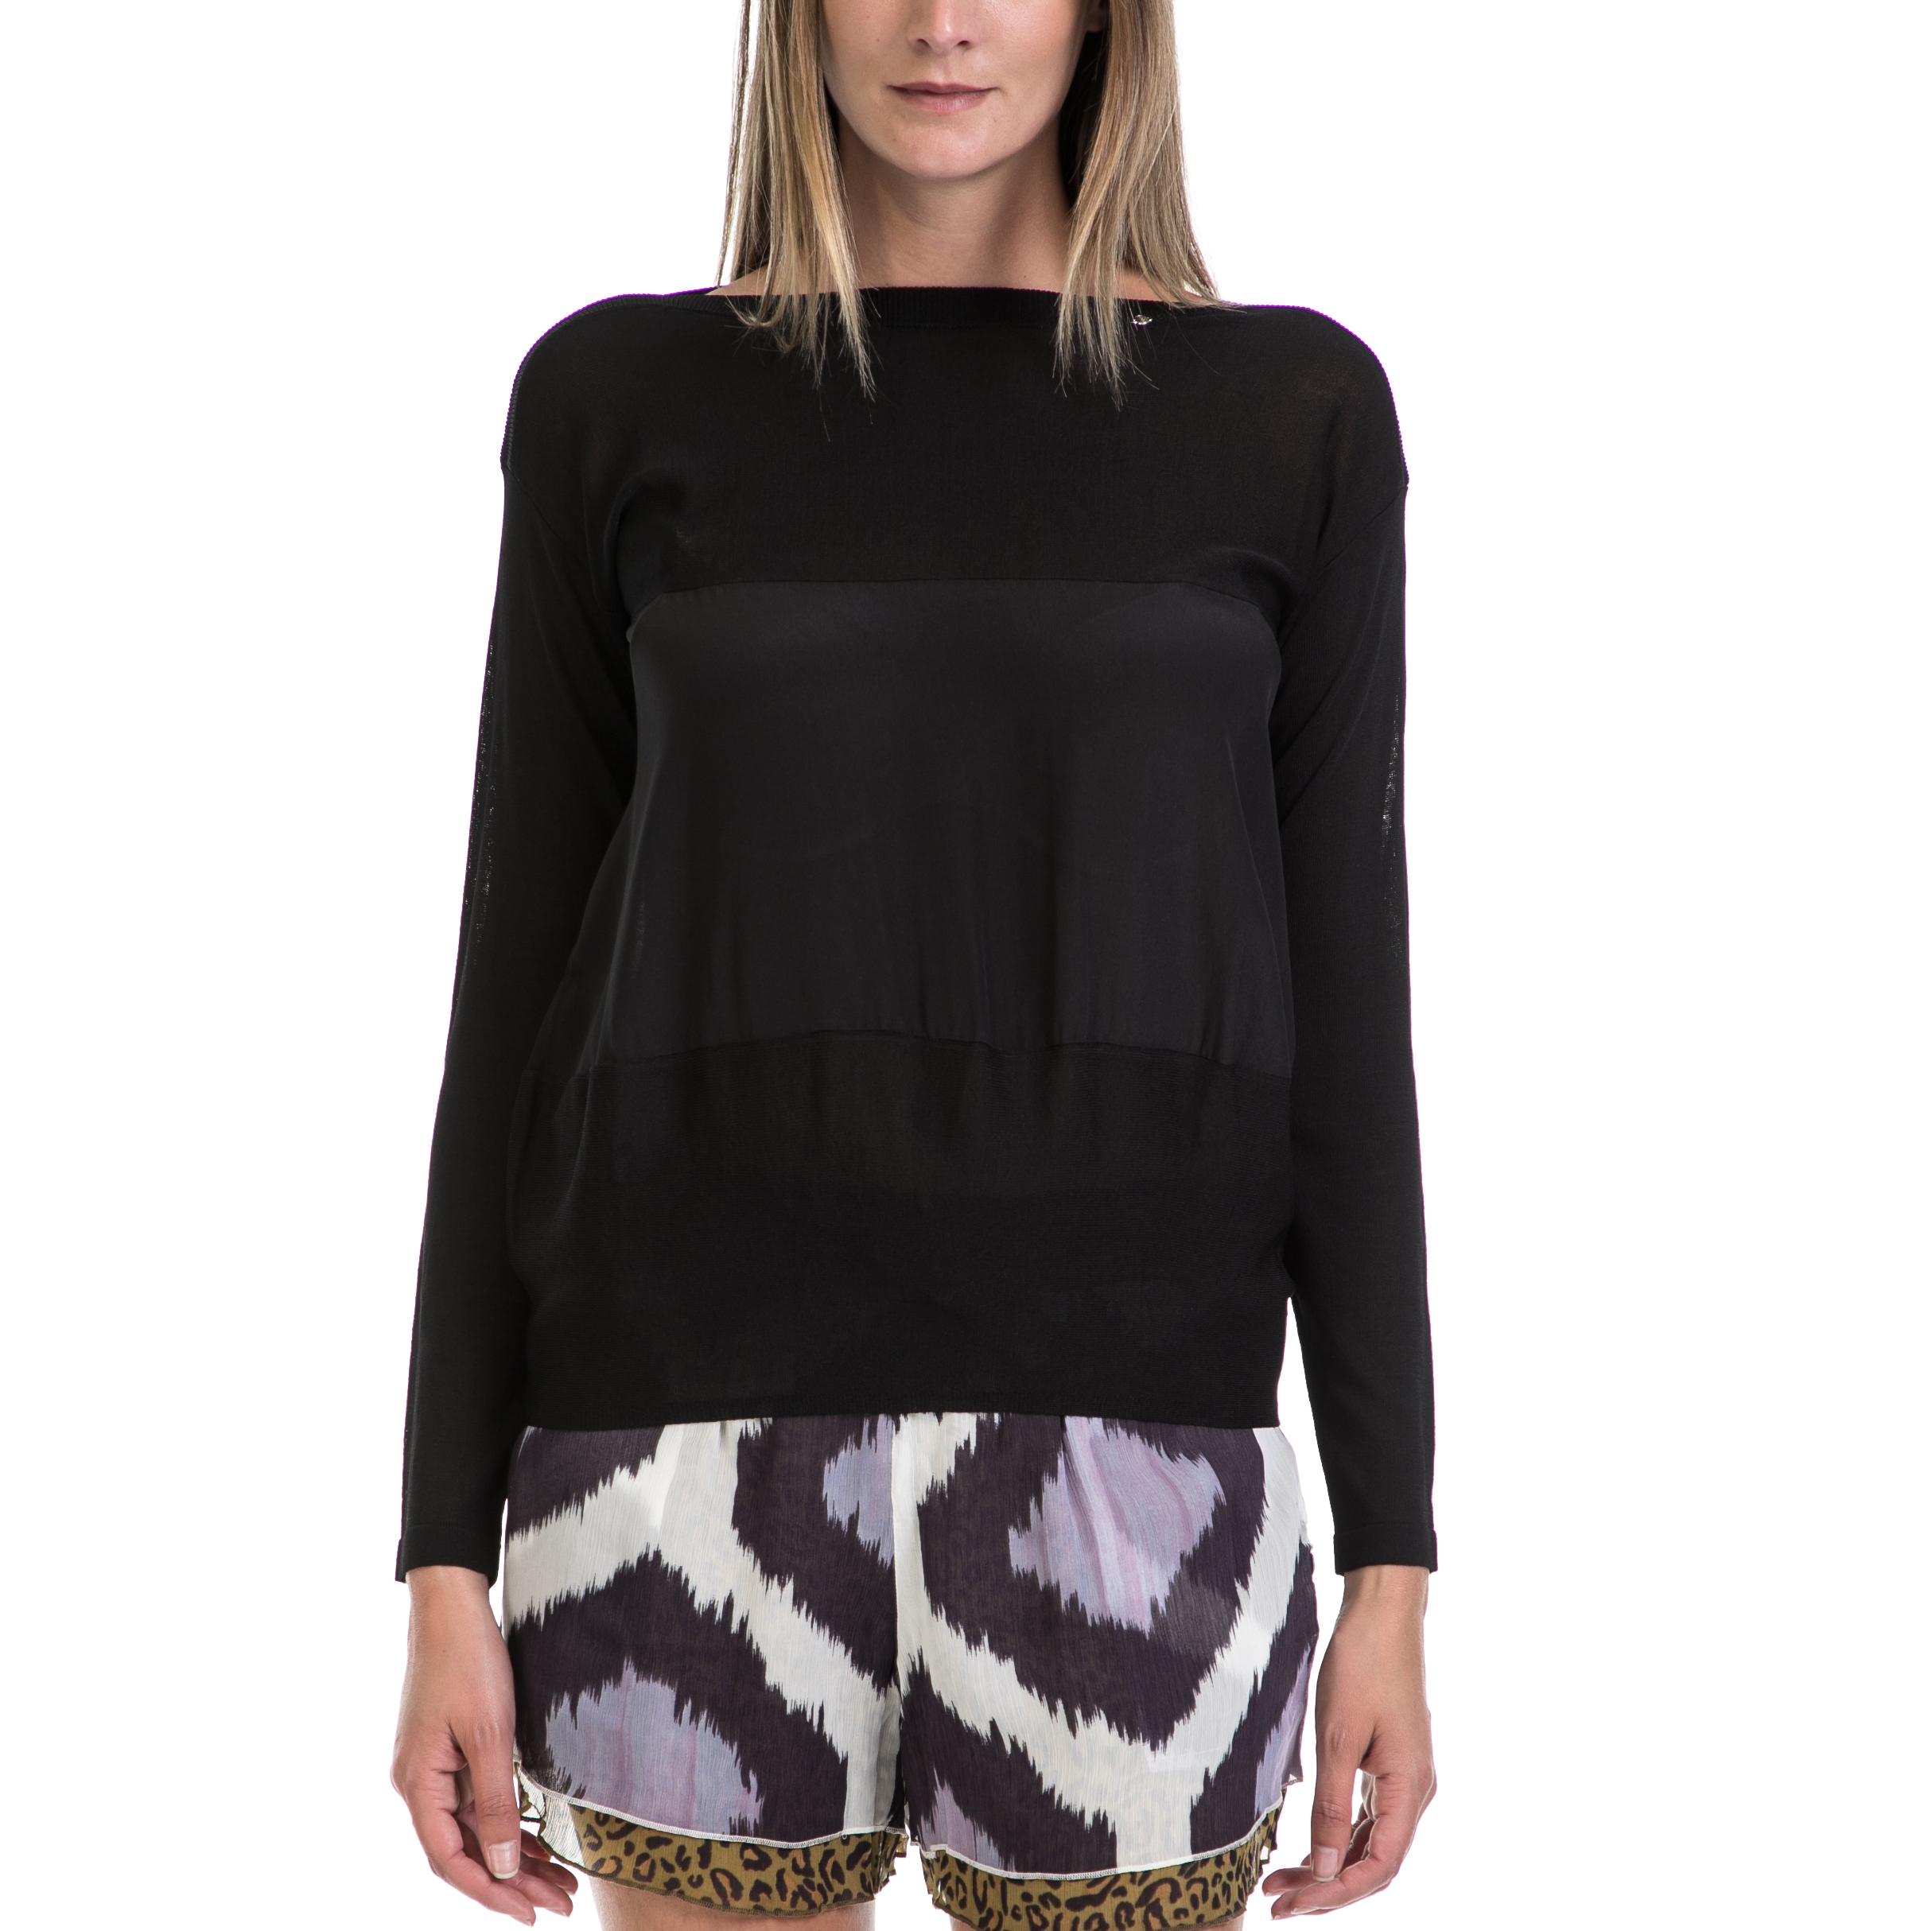 GAS - Γυναικεία μπλούζα GAS μαύρη γυναικεία ρούχα μπλούζες μακρυμάνικα